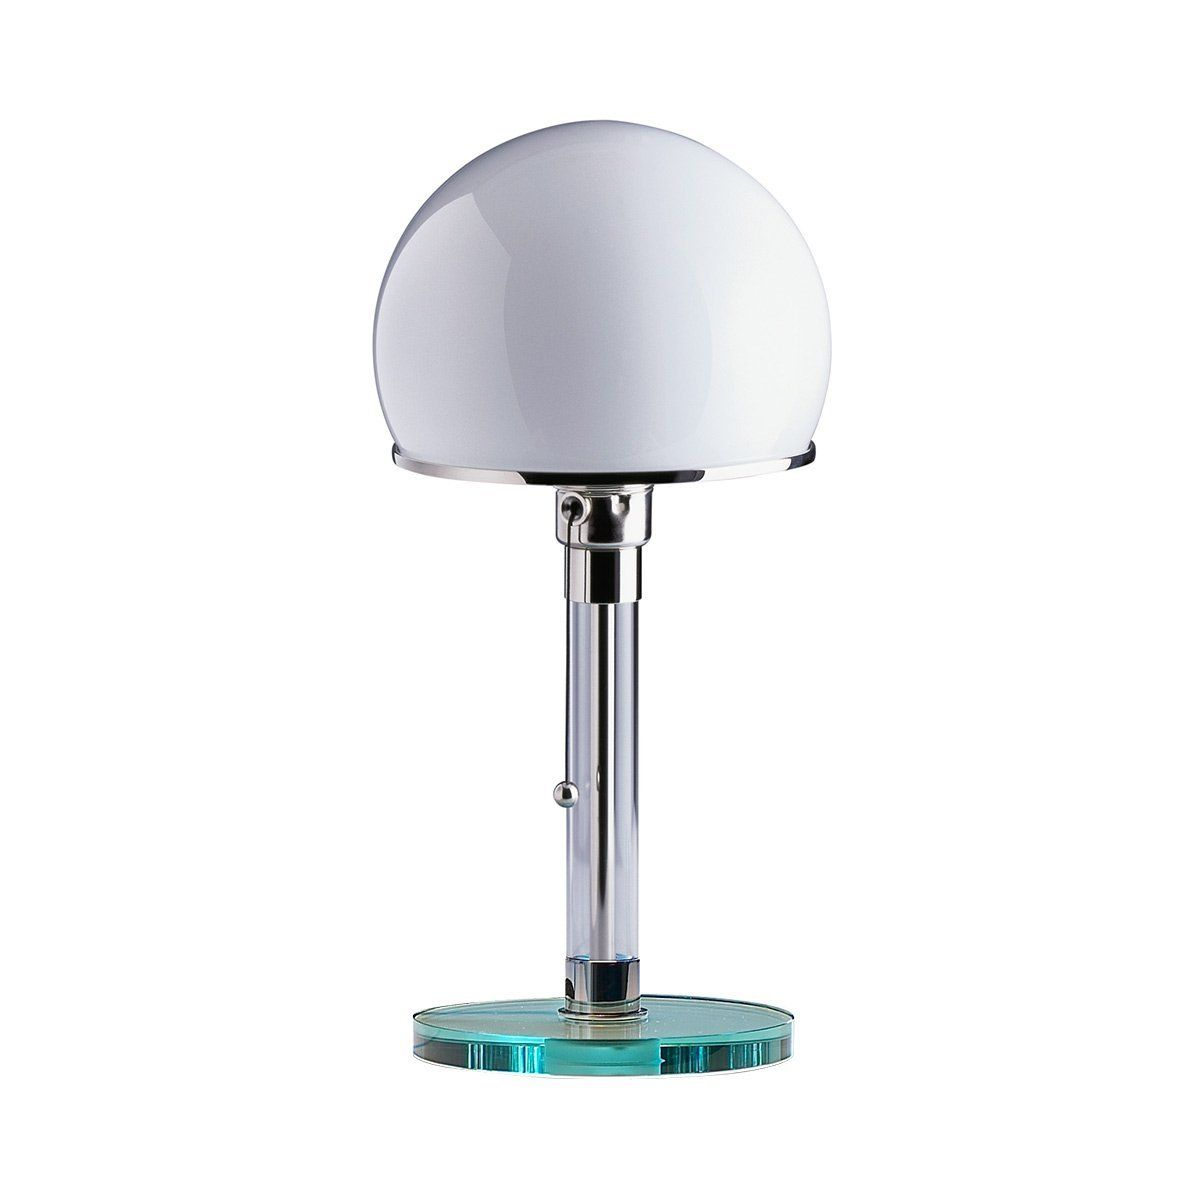 tecnolumen wg 24 tafellamp tabbers lichtdesign. Black Bedroom Furniture Sets. Home Design Ideas